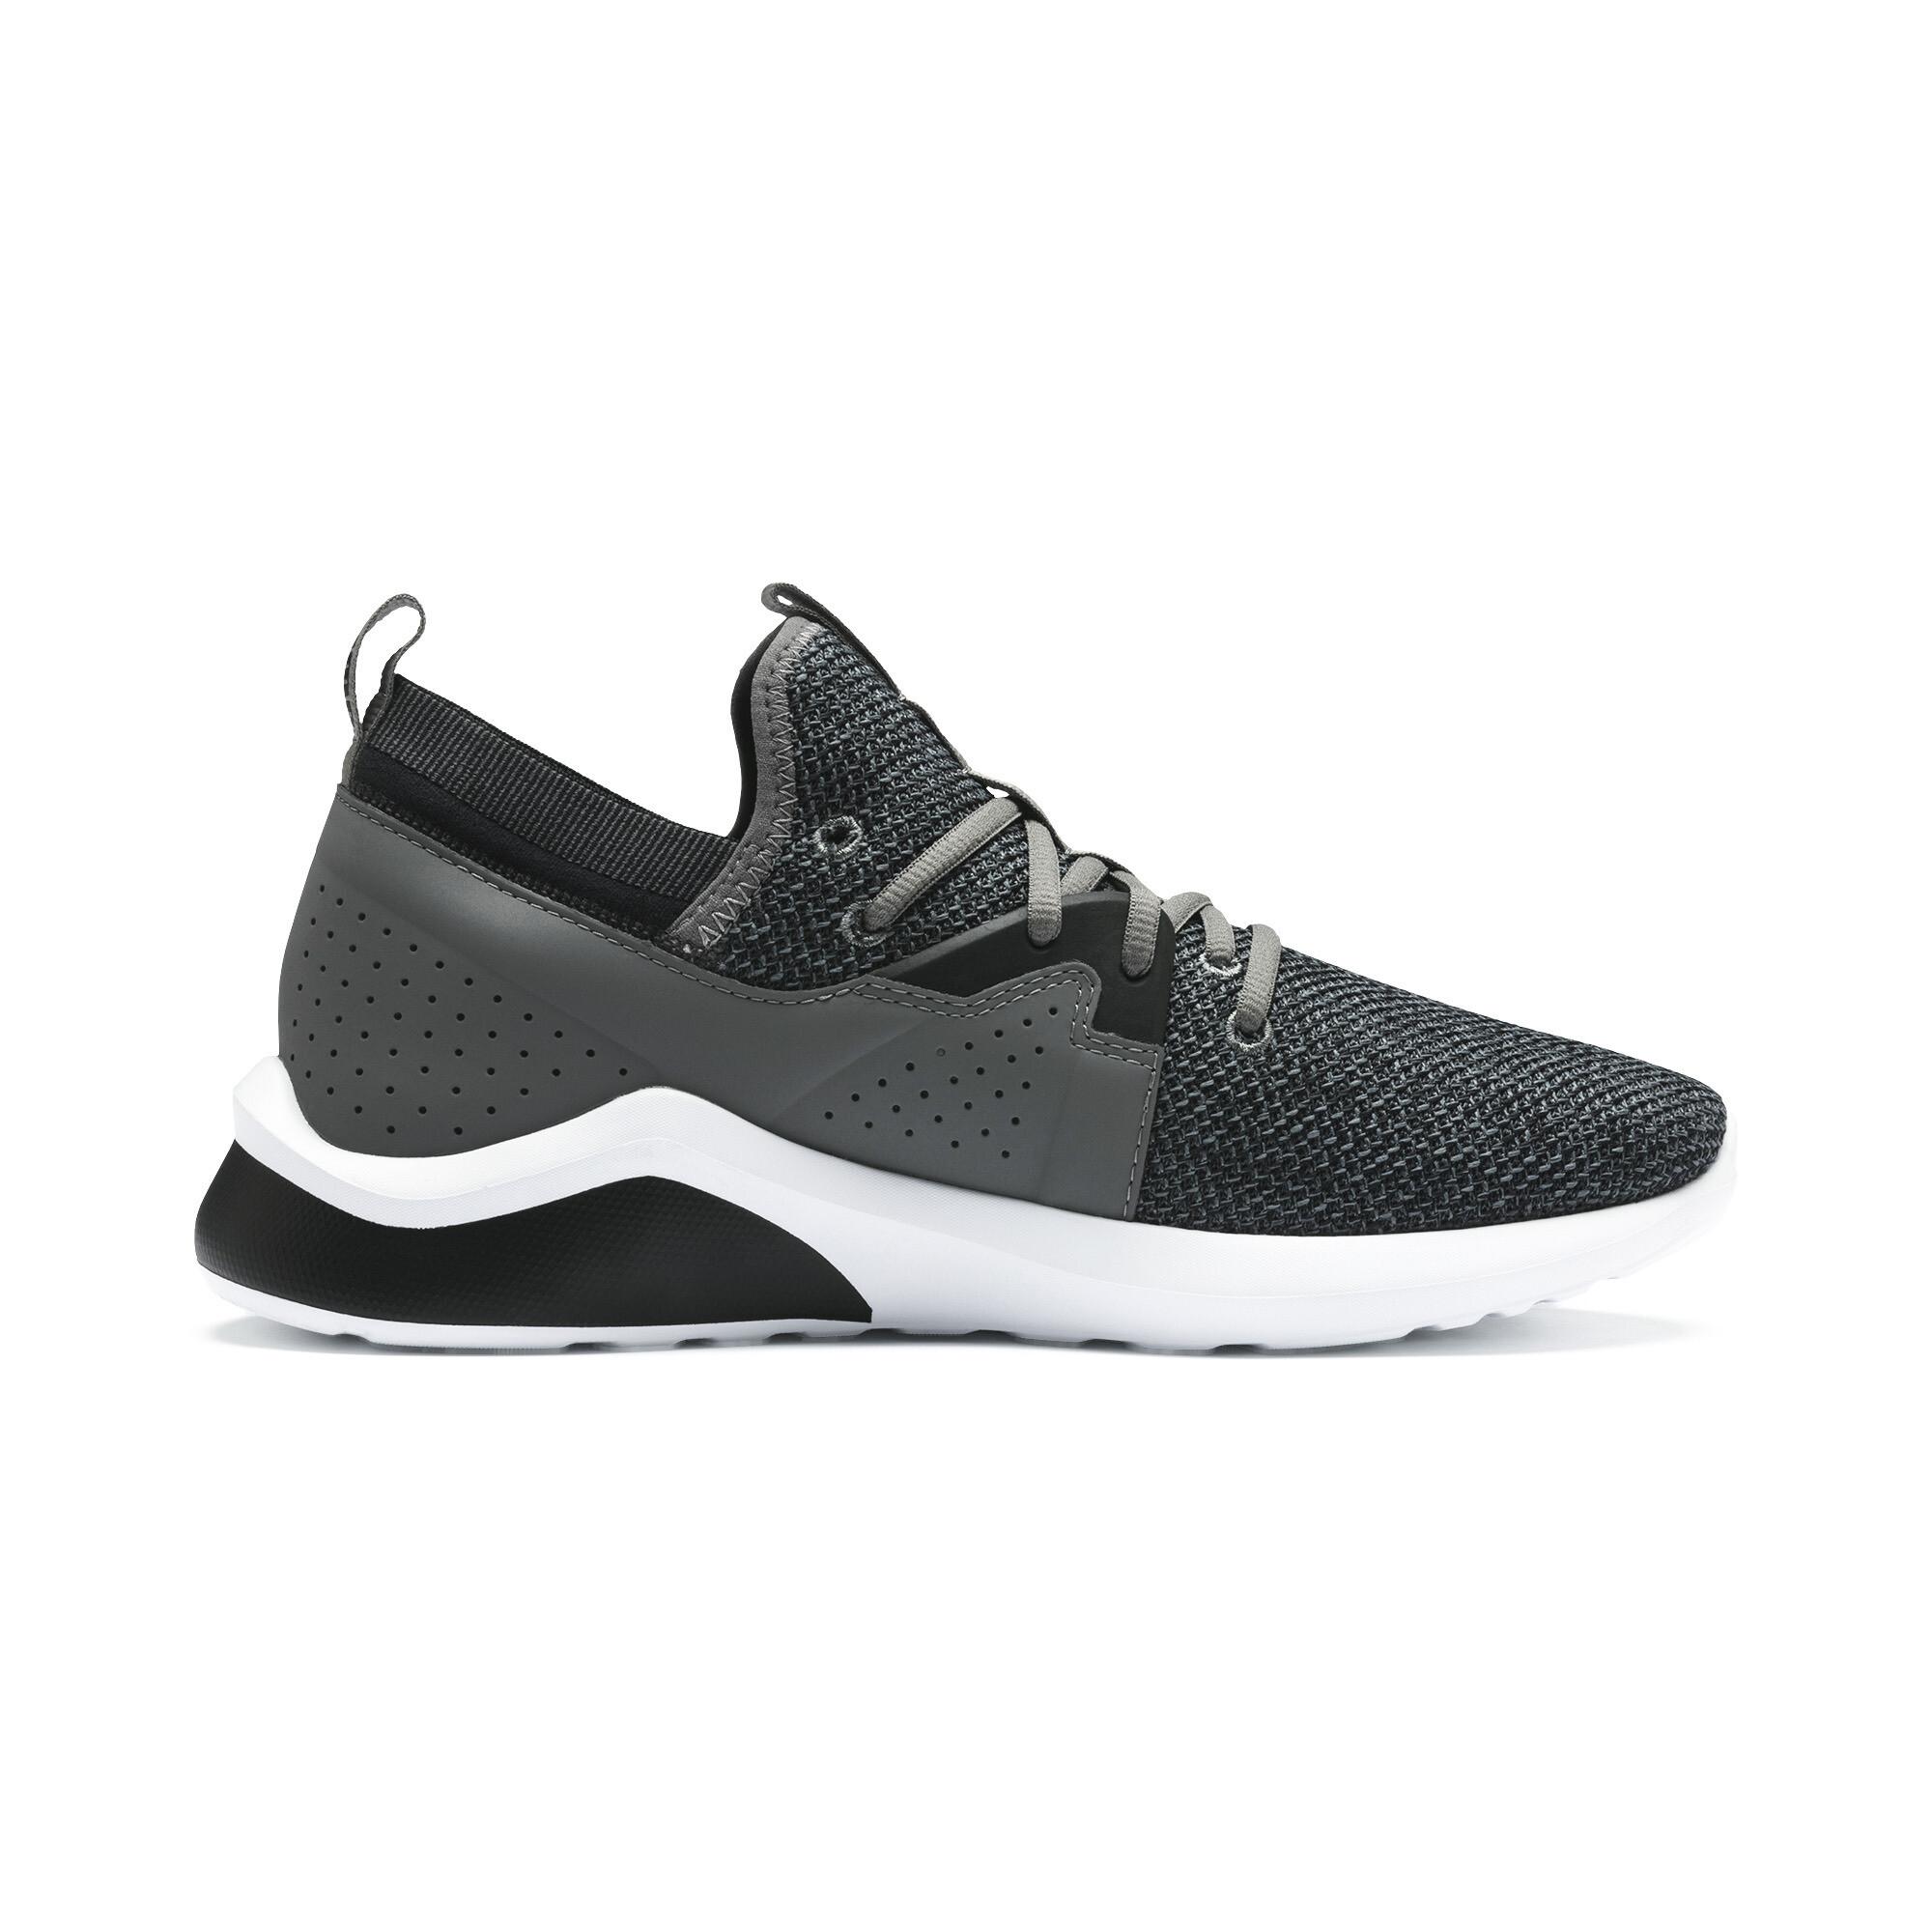 PUMA-Emergence-Men-039-s-Sneakers-Men-Shoe-Running thumbnail 19